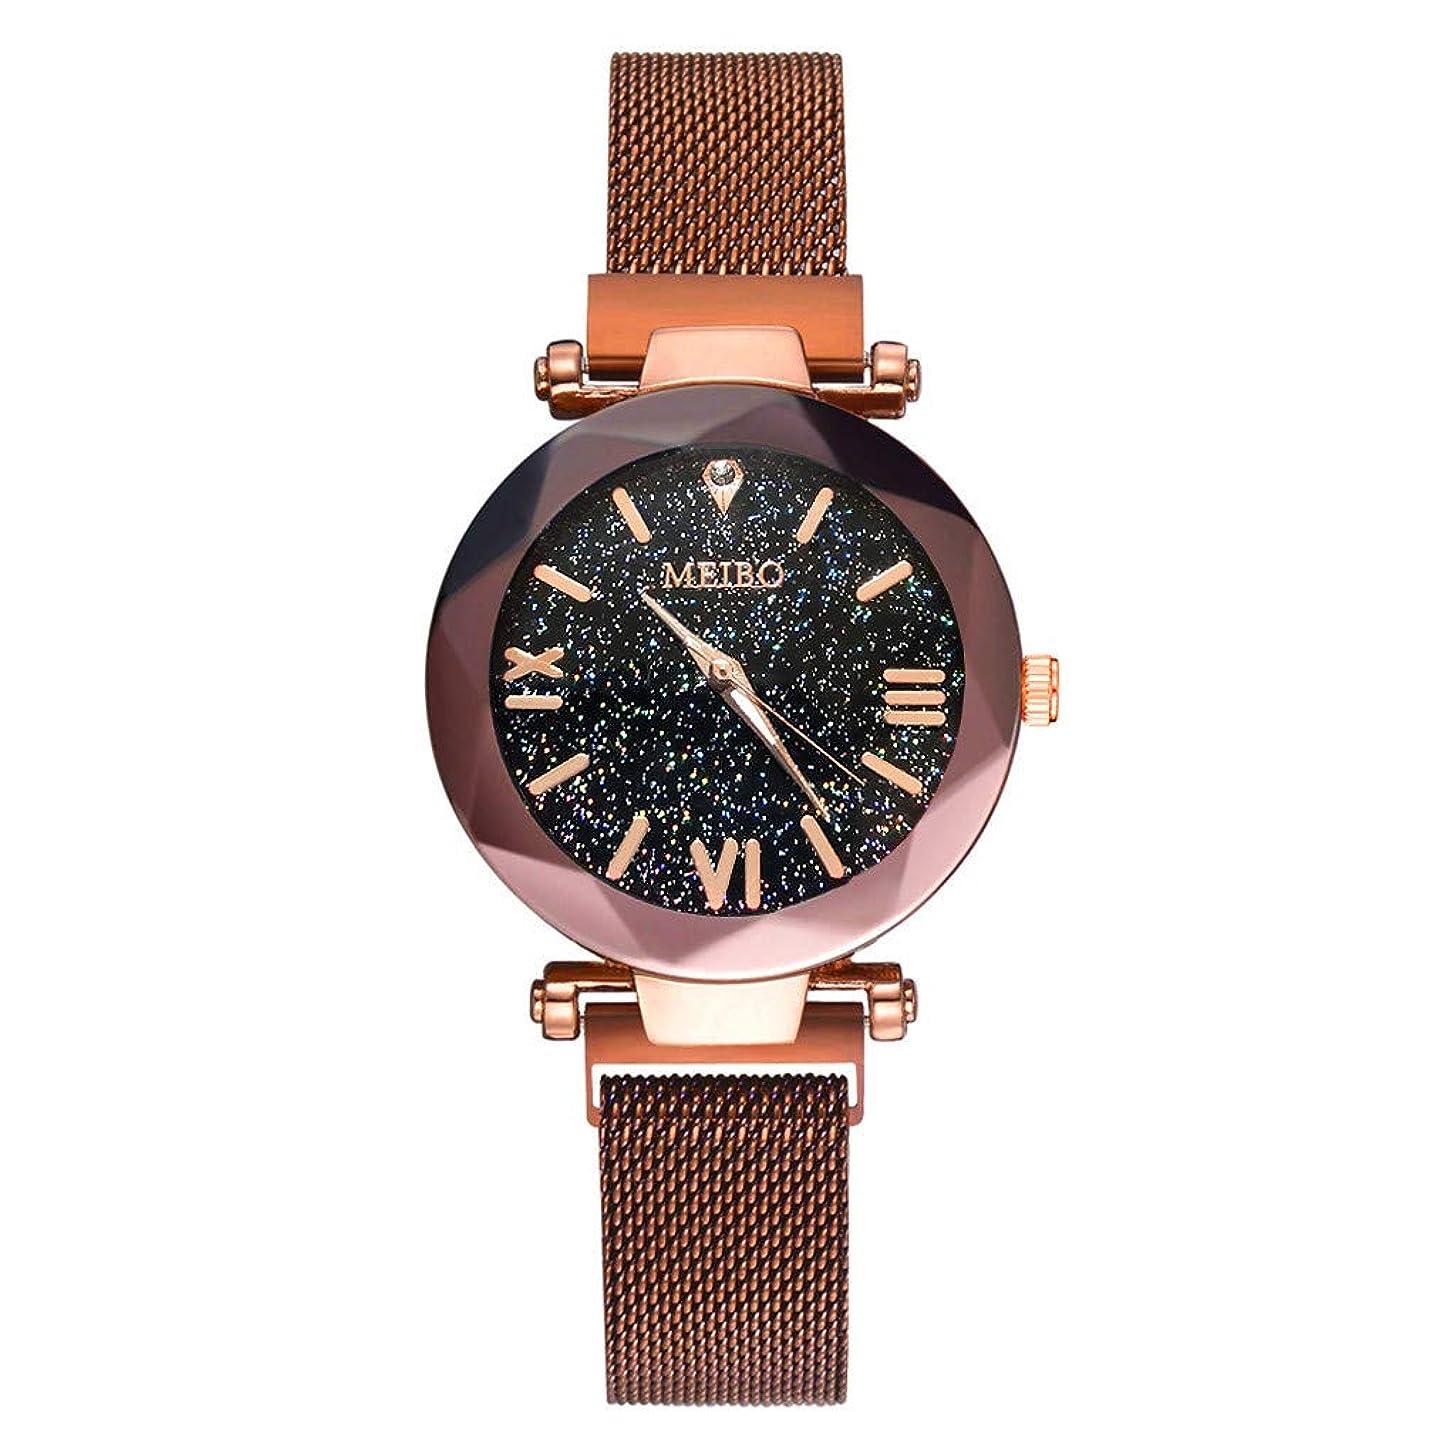 2019 Spring Deals! Fashion Women Watches Quartz Stainless Steel Wristwatch Magnet Buckle Starry Sky Analog Wrist Watch Lover Gift Valentine's Day Present